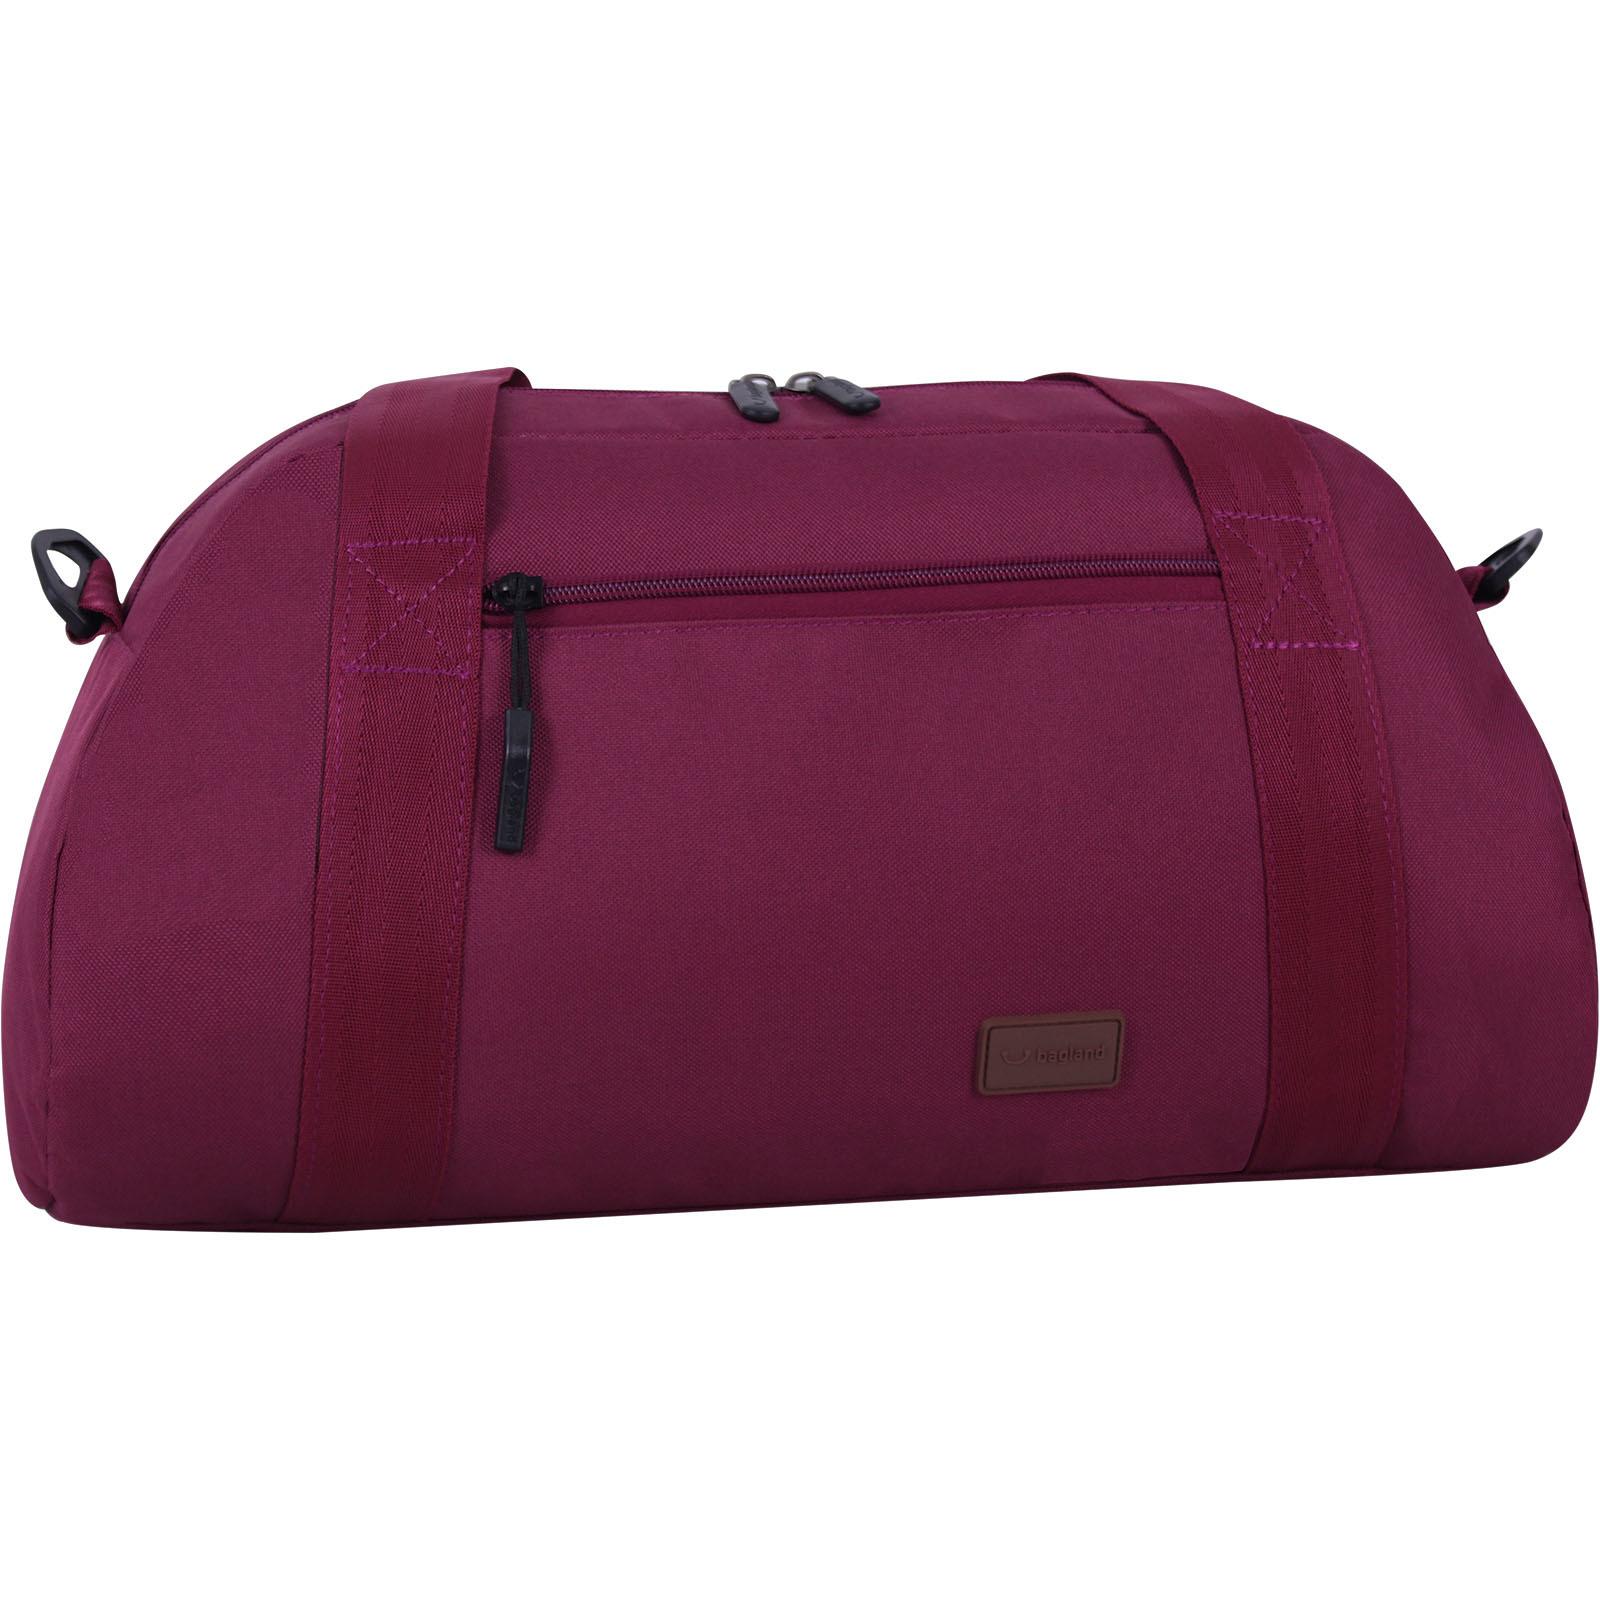 Спортивные сумки Сумка Bagland Oblivion 27 л. Вишня (0037366) IMG_6254-1600.jpg